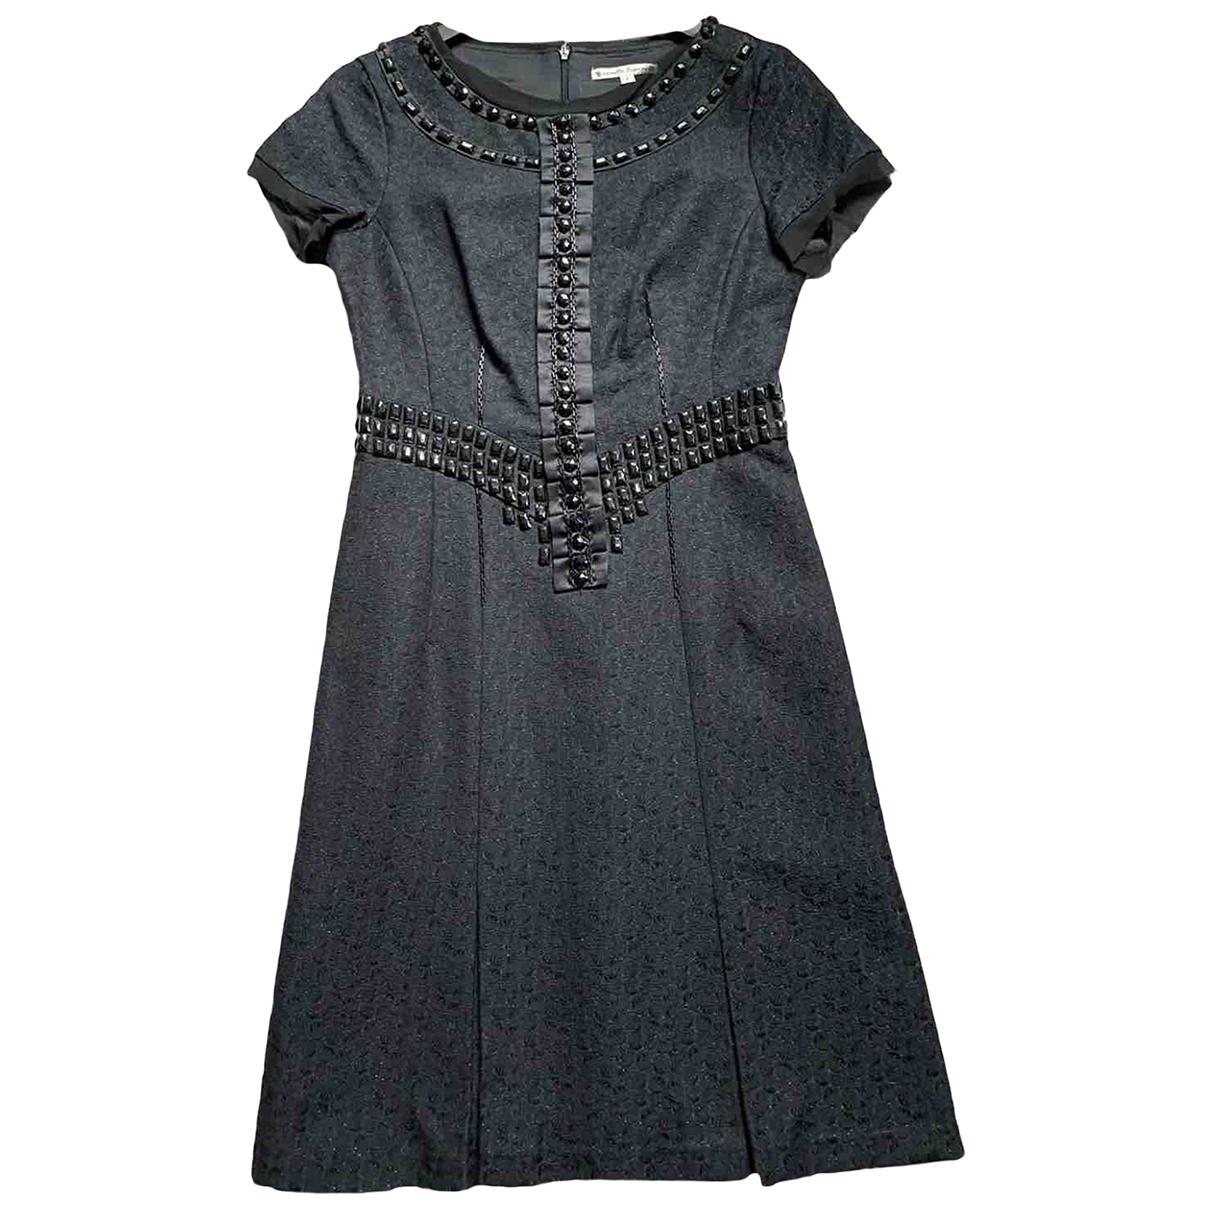 Nanette Lepore \N Kleid in  Schwarz Baumwolle